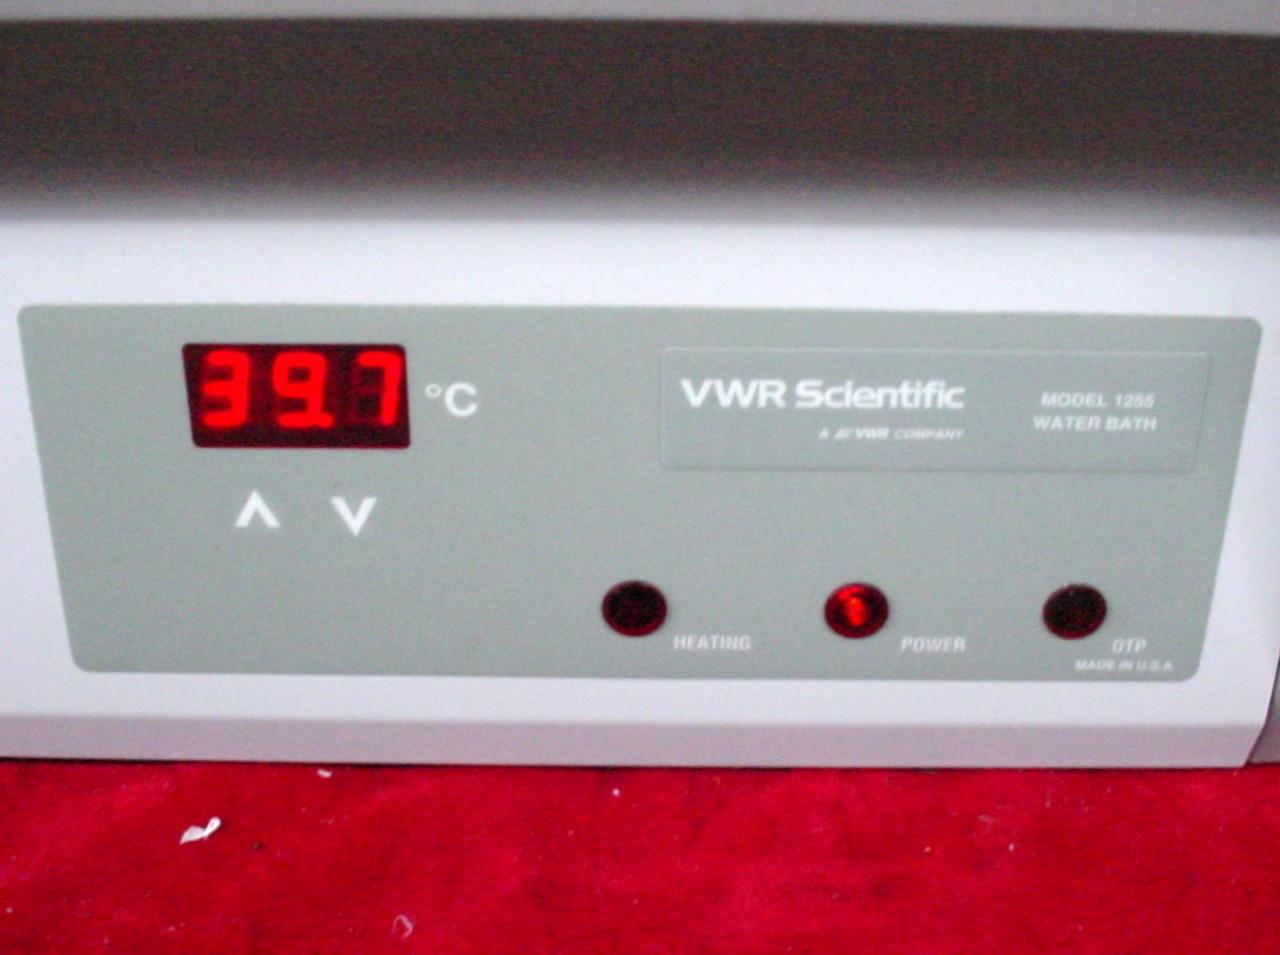 VWR SCIENTIFIC 1255 DUAL CHAMBER HOT WATER BATH | eBay